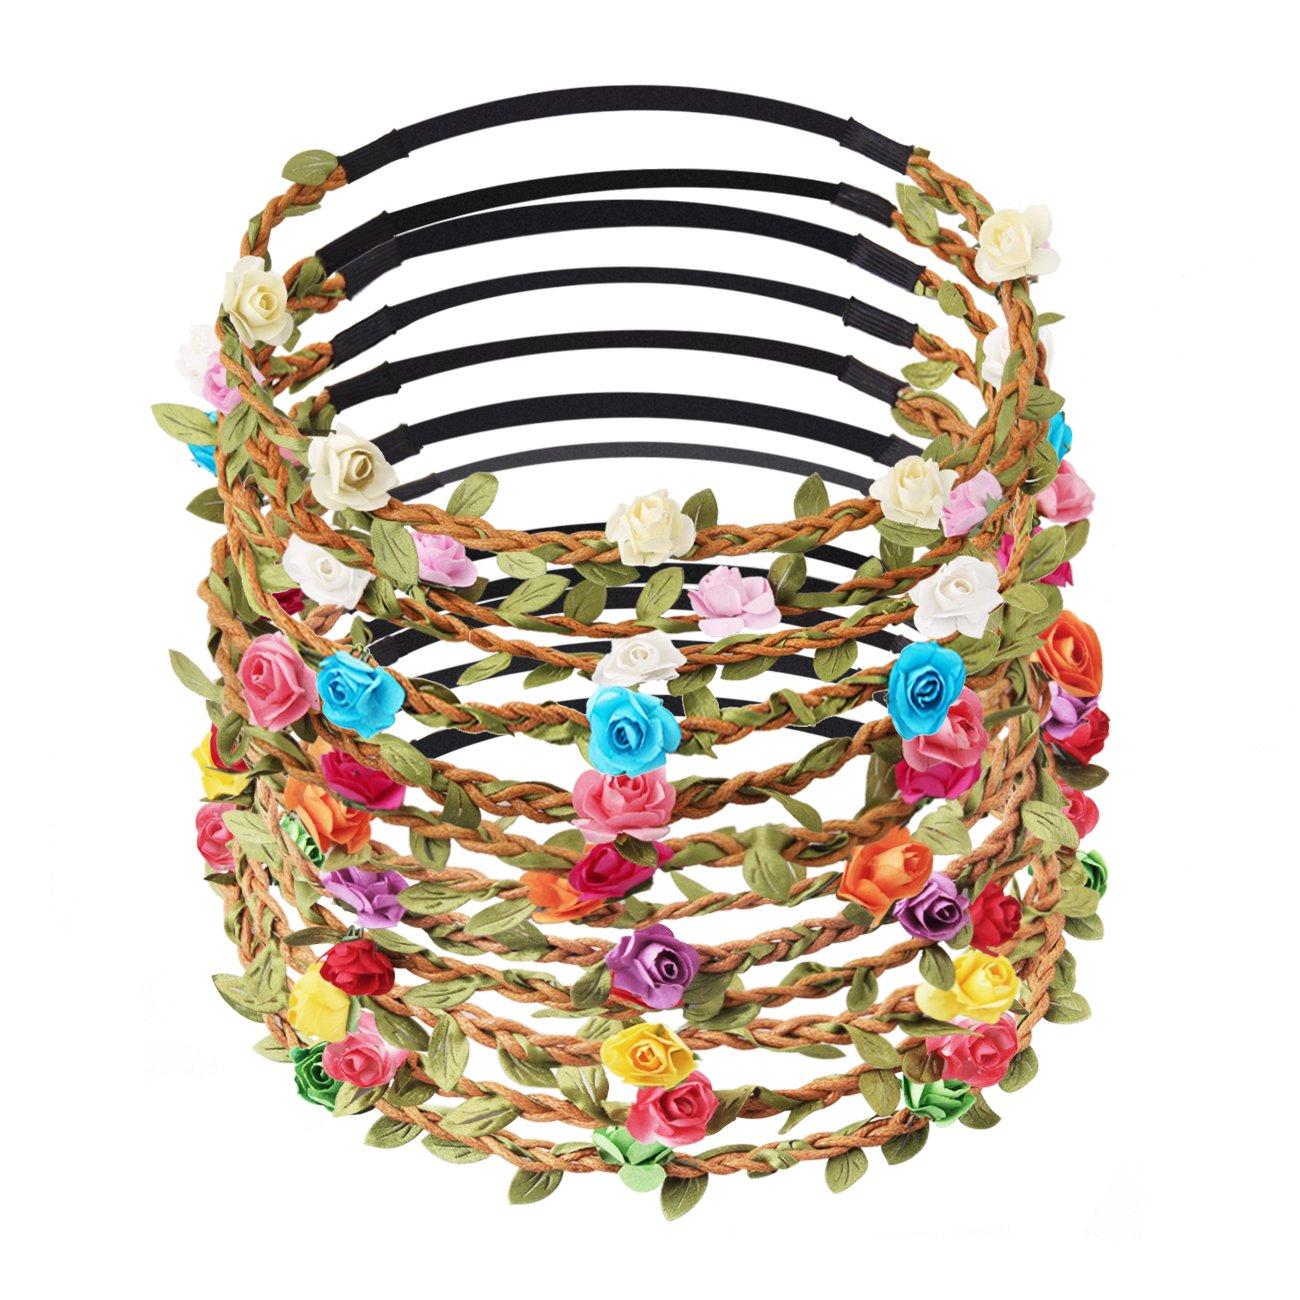 Candygirl 12pcs Girl Fashion Bohemian Flower Crown Floral Garland Headbands For Girls